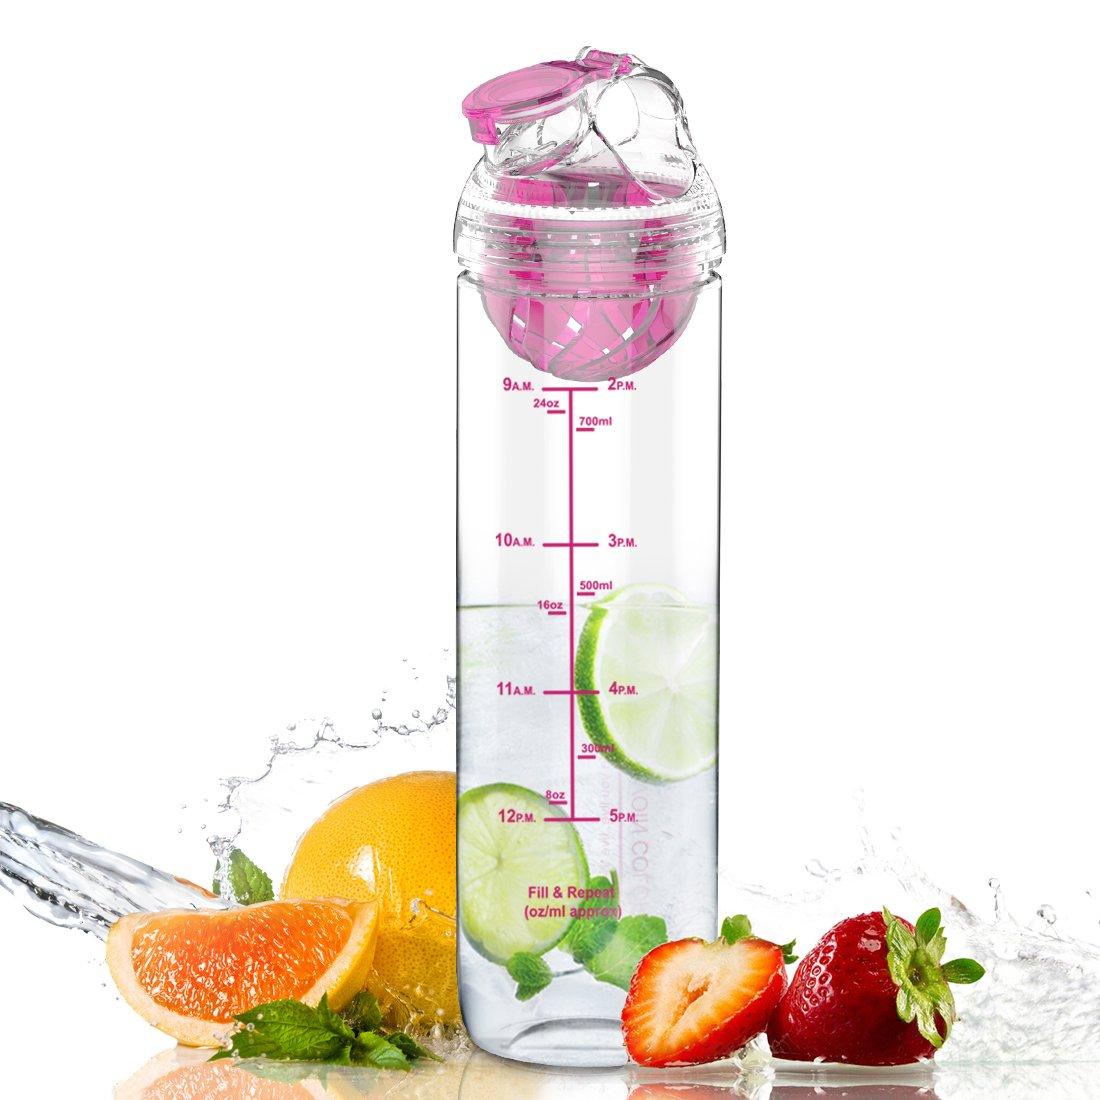 AVOIN colorlife 27oz。スポーツTritanフルーツInfuser Water Bottle (多くの色オプション) – BPAフリー B0756ZYJG4 Cherry Pink